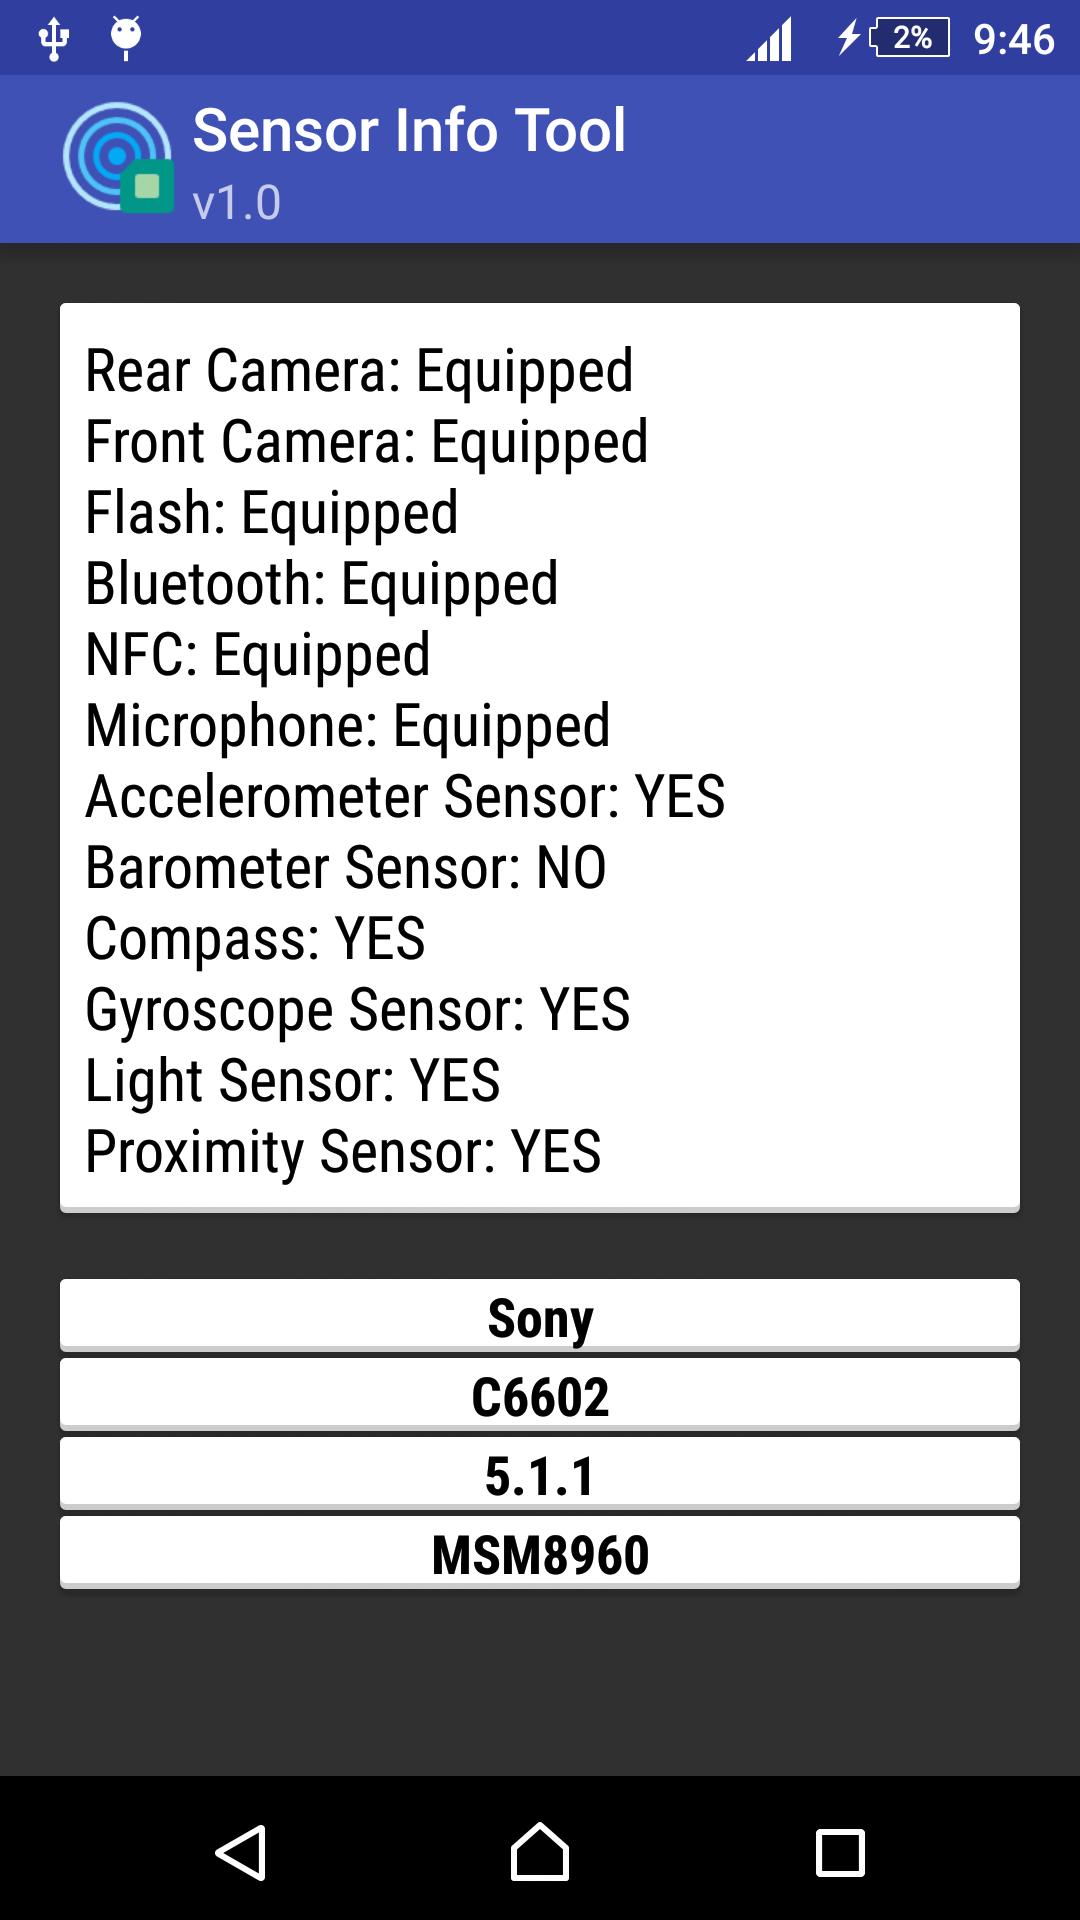 Sensor Info Tool